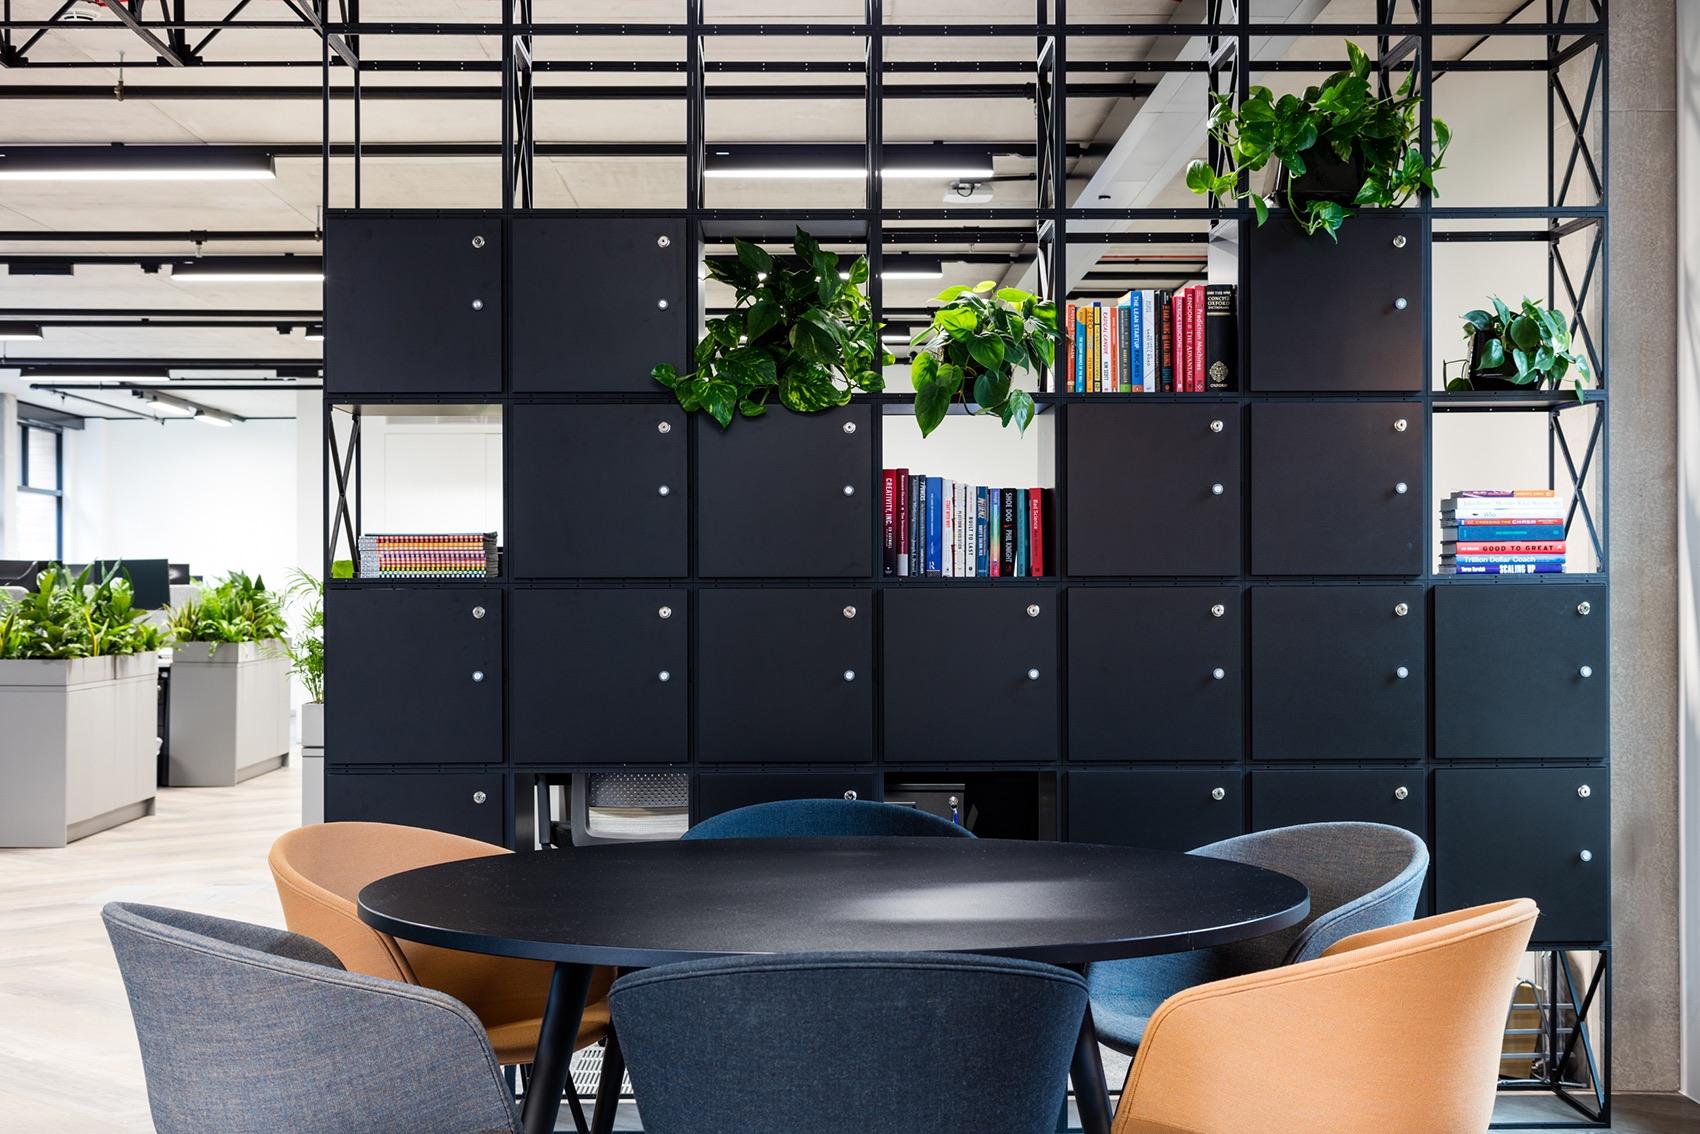 albion-capital-london-office-12